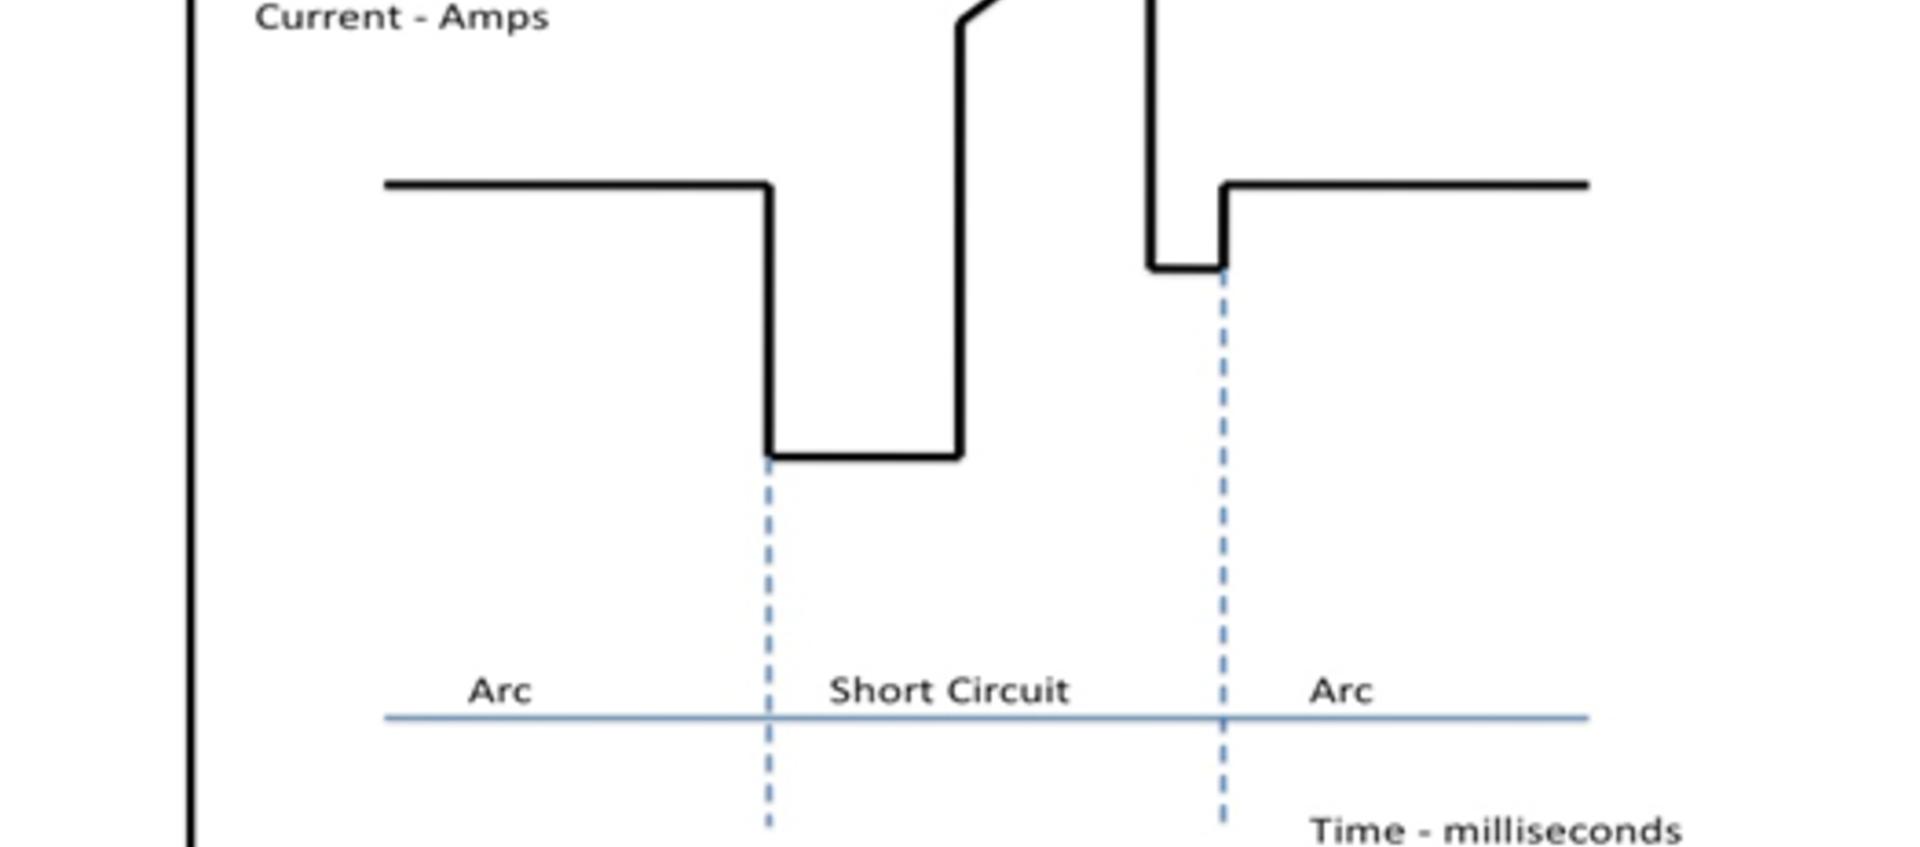 Recent Gas Metal Arc Welding (GMAW) Process Developments